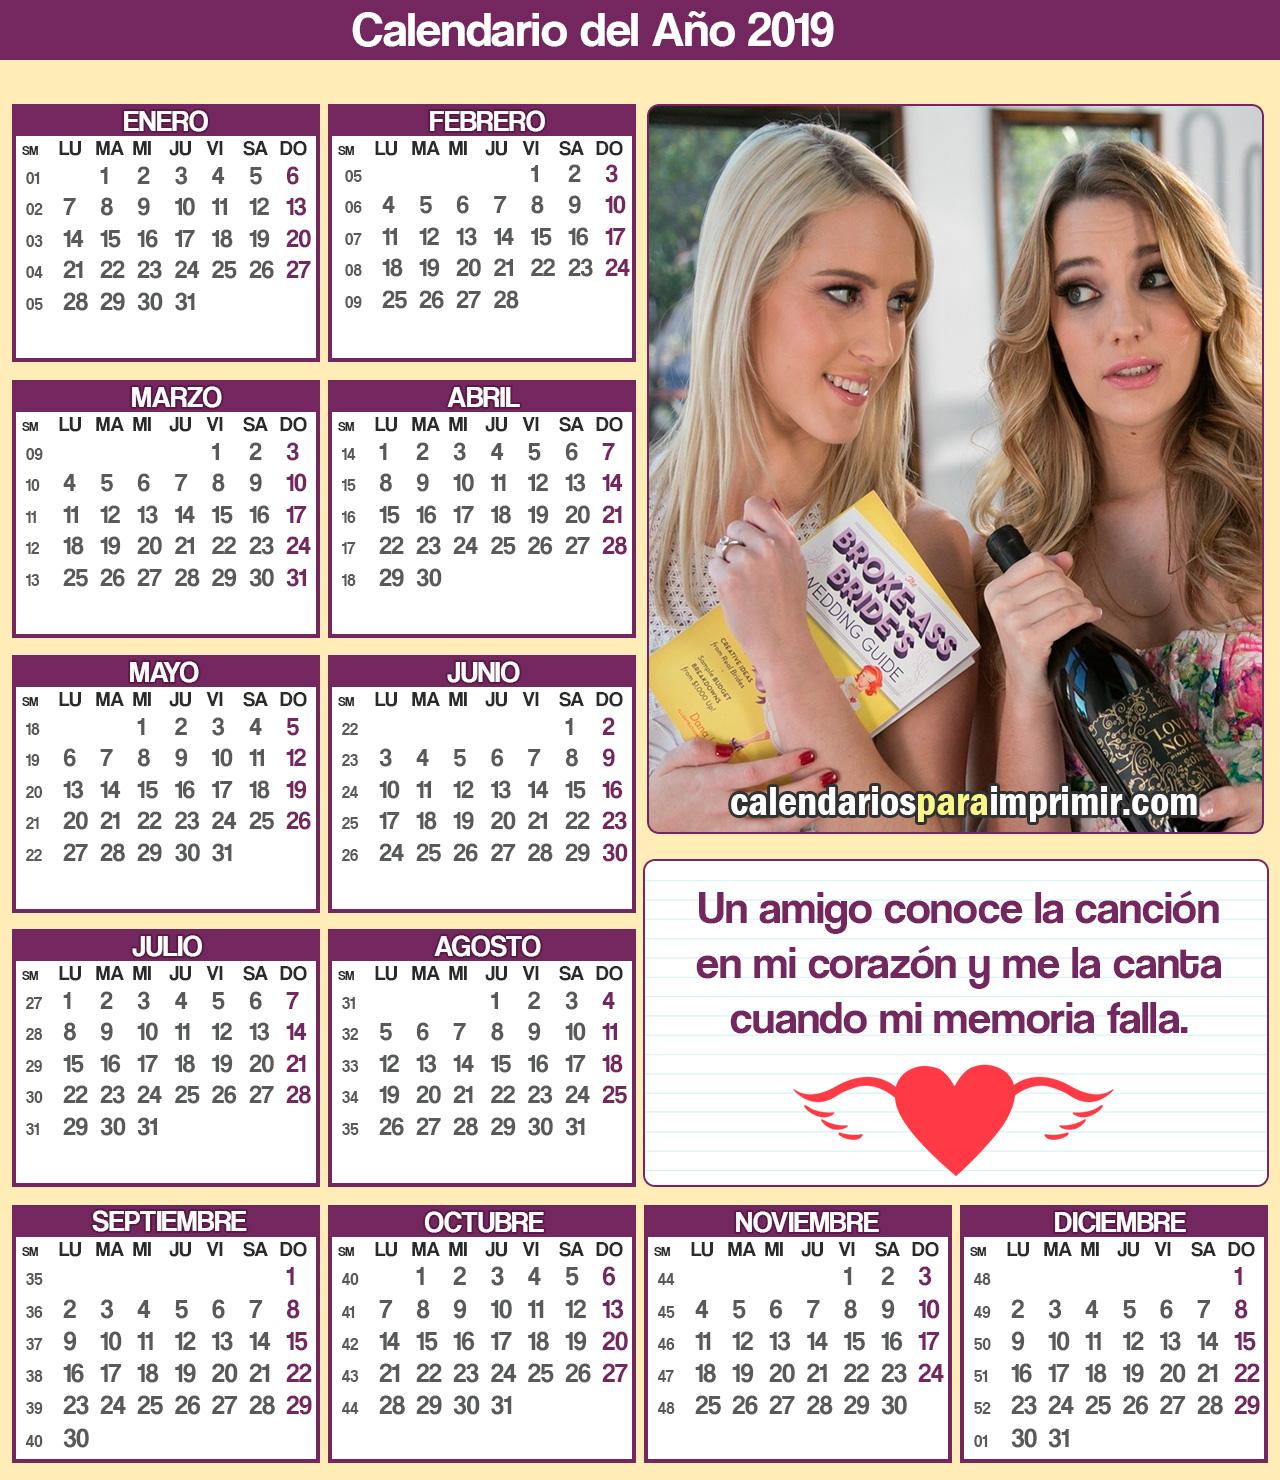 calendario para imprimir de amistad 2019